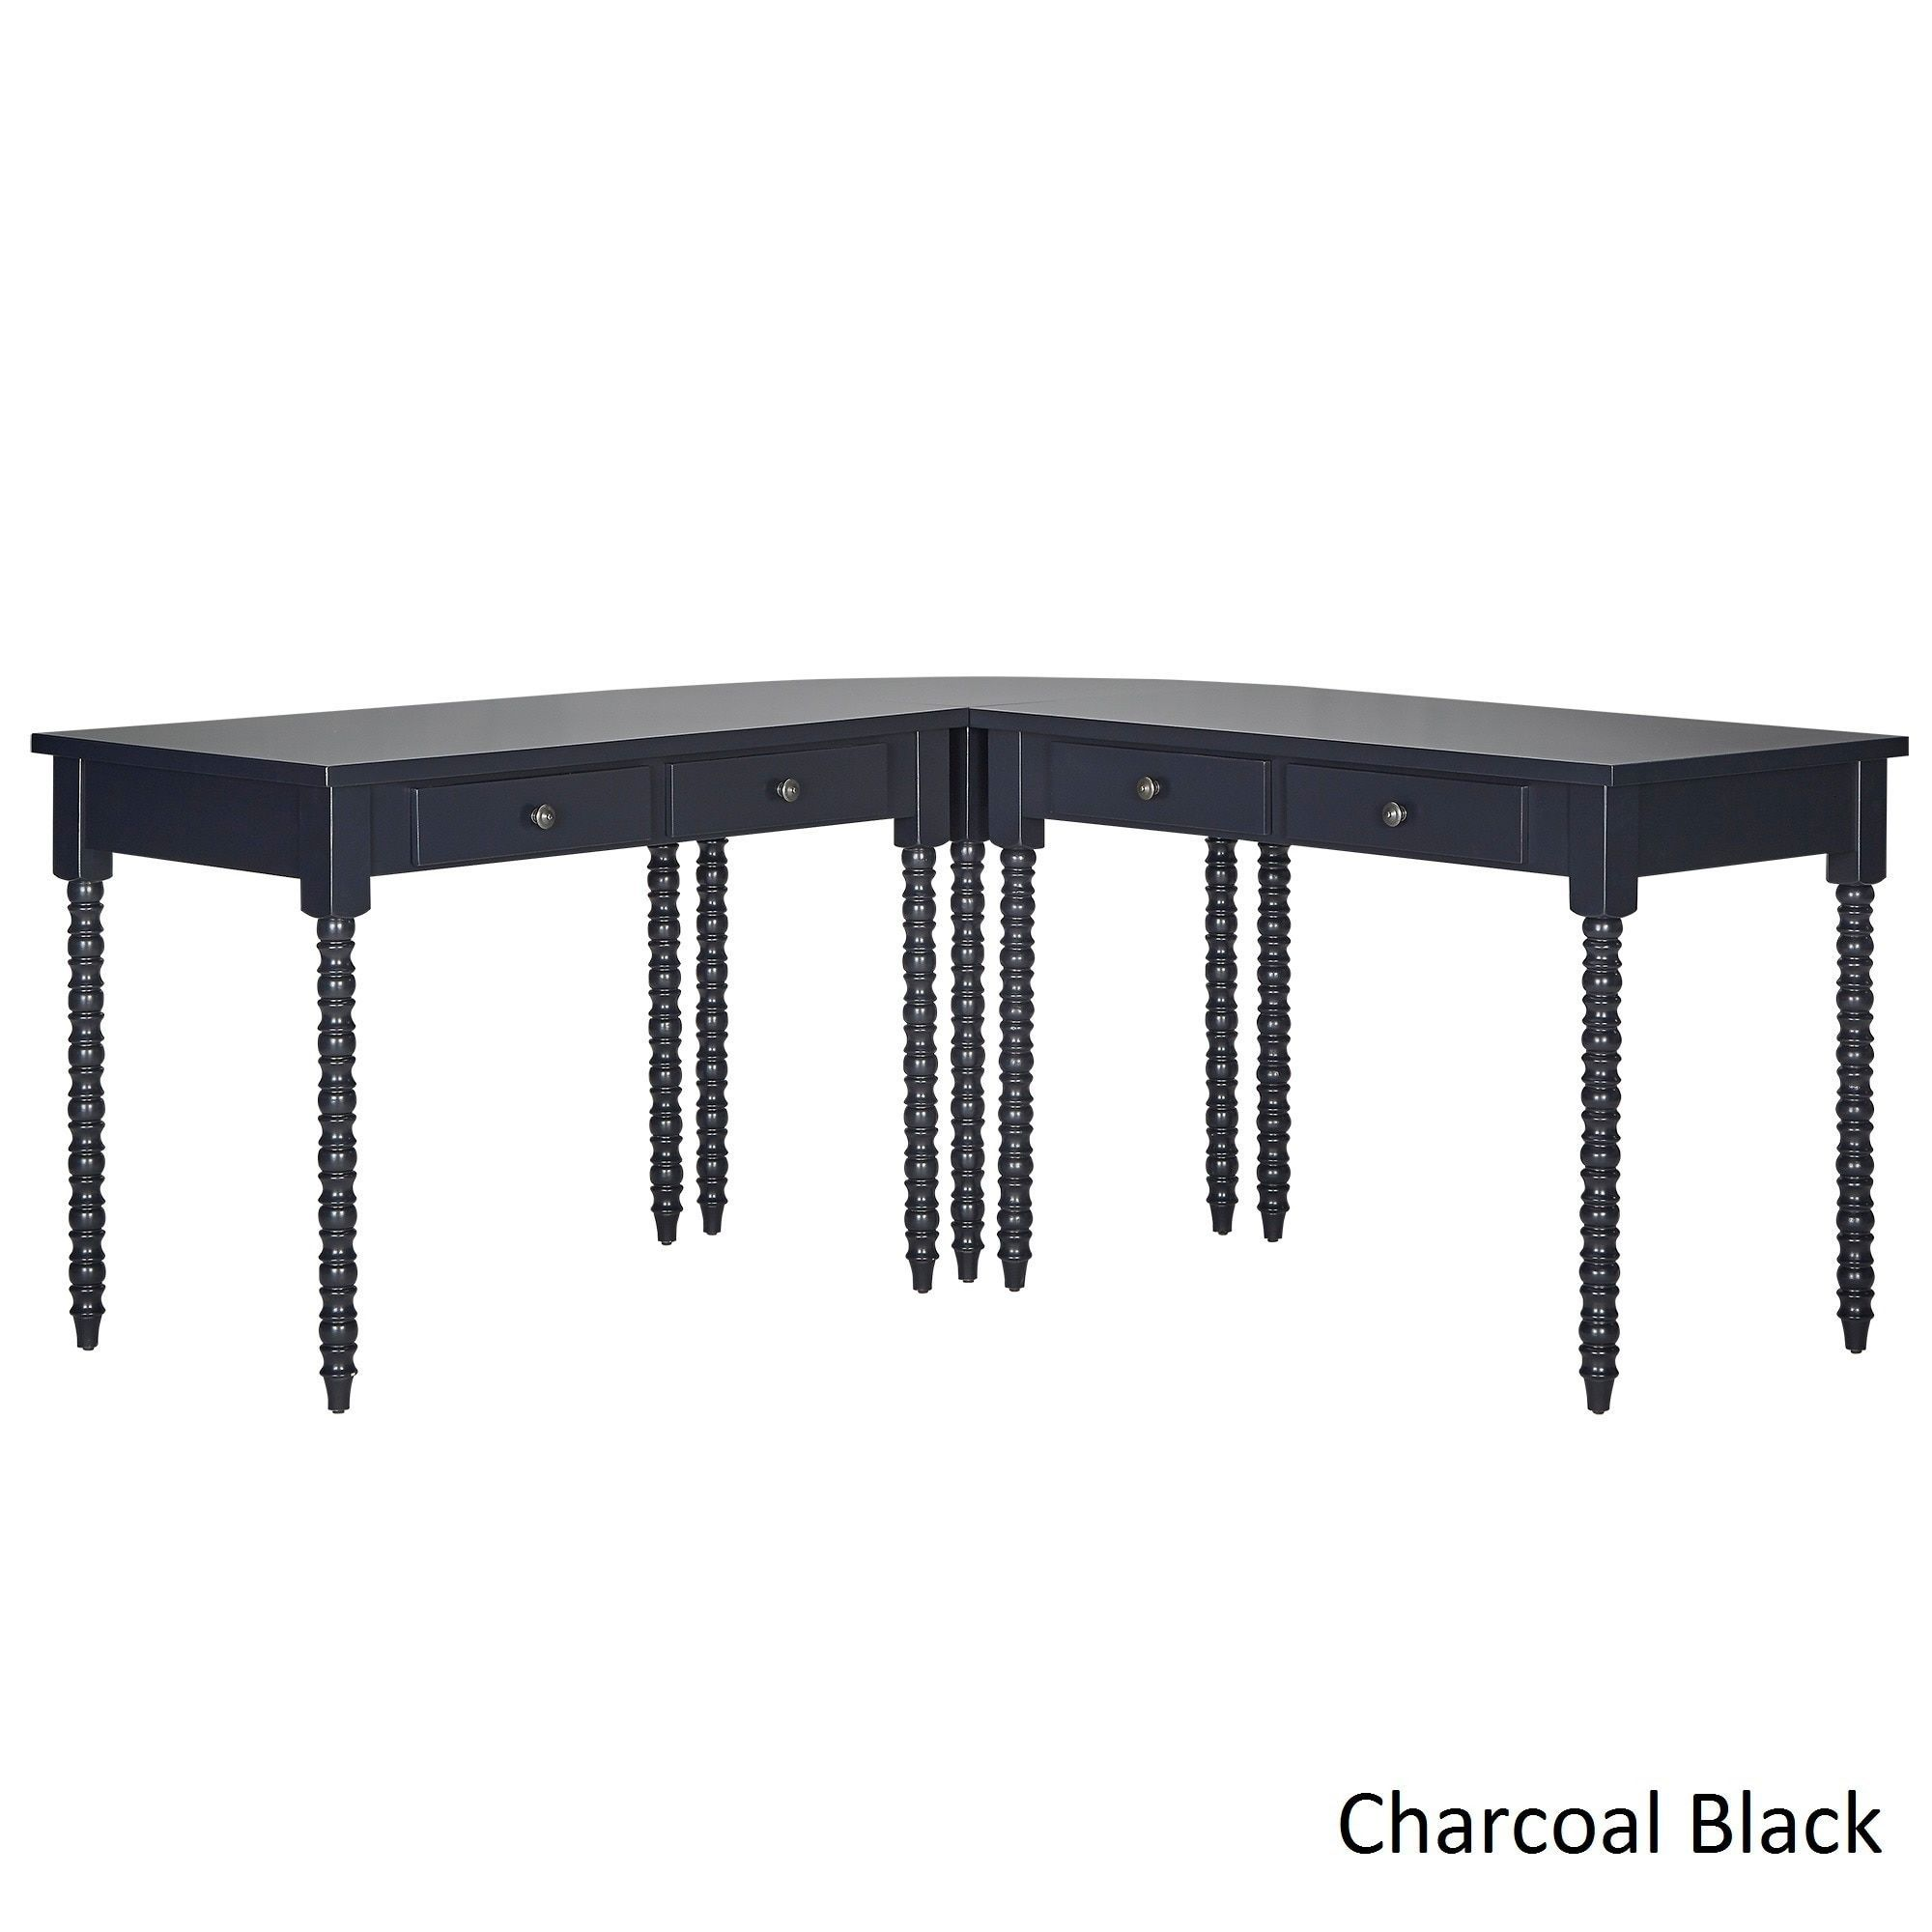 Lyndale L-Shaped Helix Legs Corner Office Desk by Inspire Q (Charcoal Black)